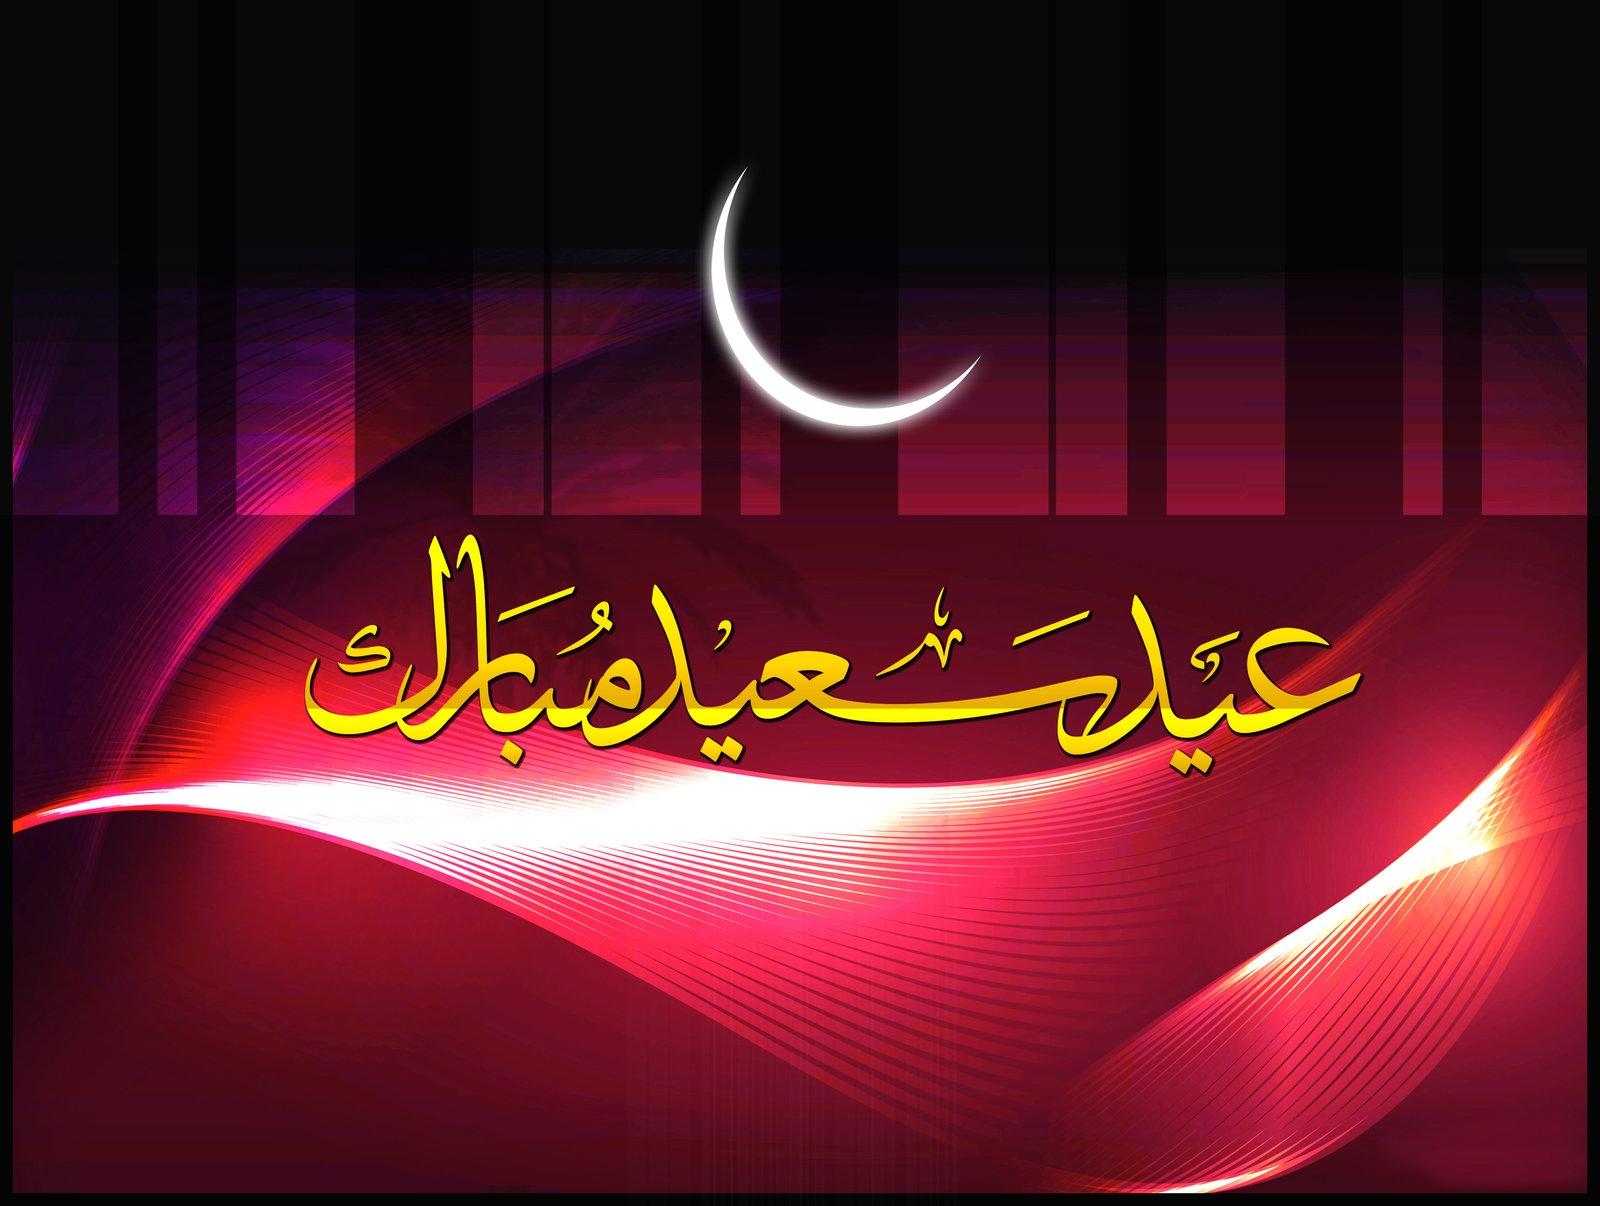 Free Eid Adha Mubarak Greetings Card